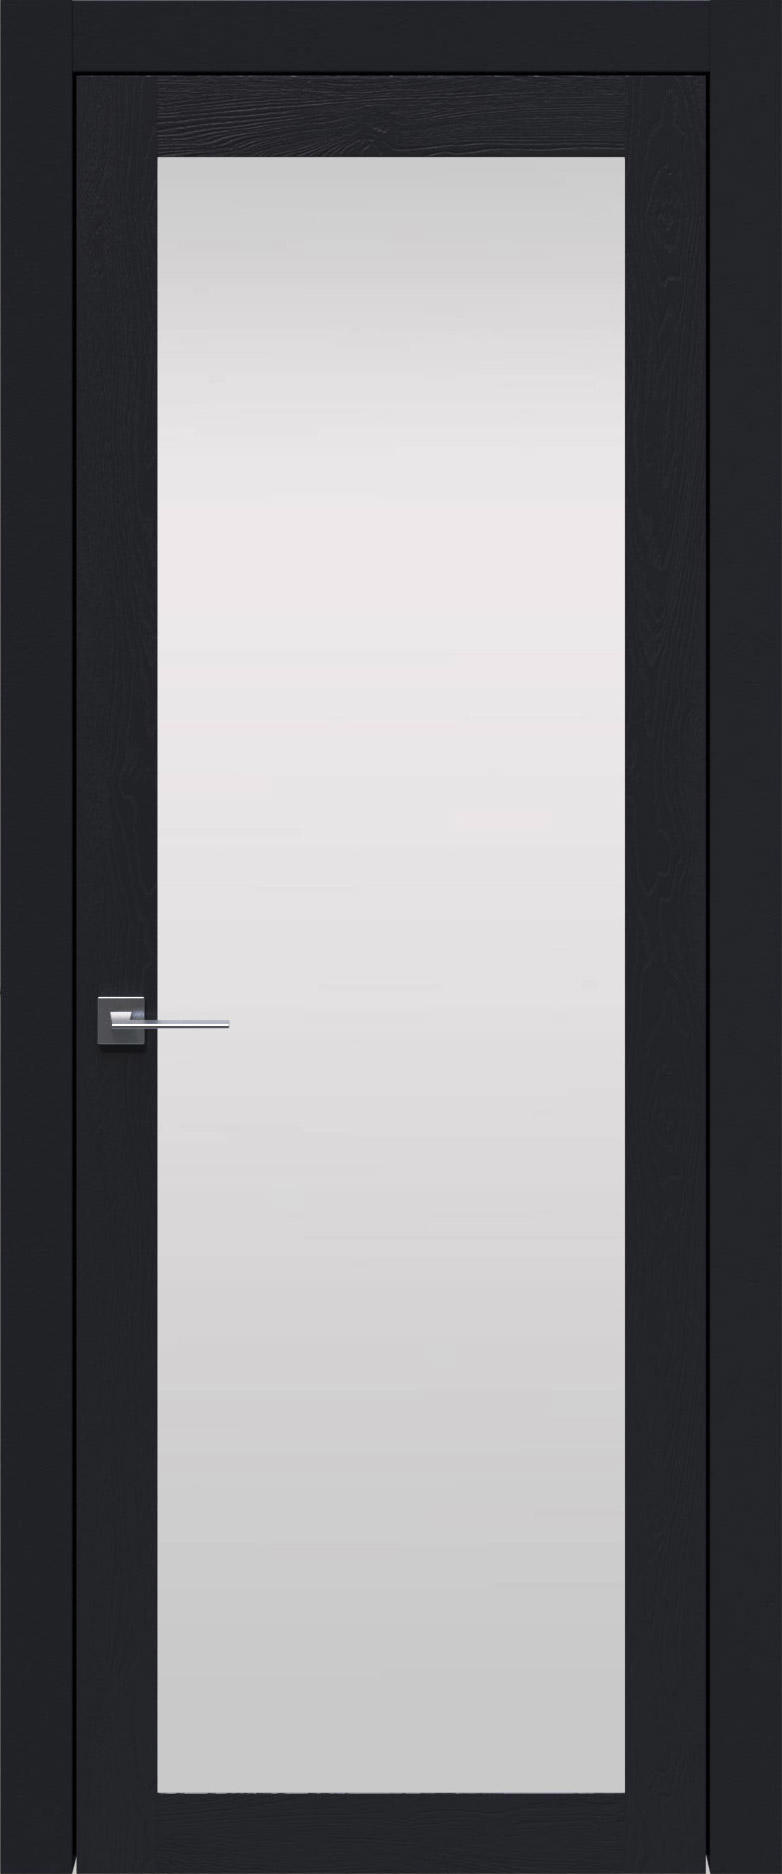 Tivoli З-1 цвет - Черная эмаль по шпону (RAL 9004) Со стеклом (ДО)